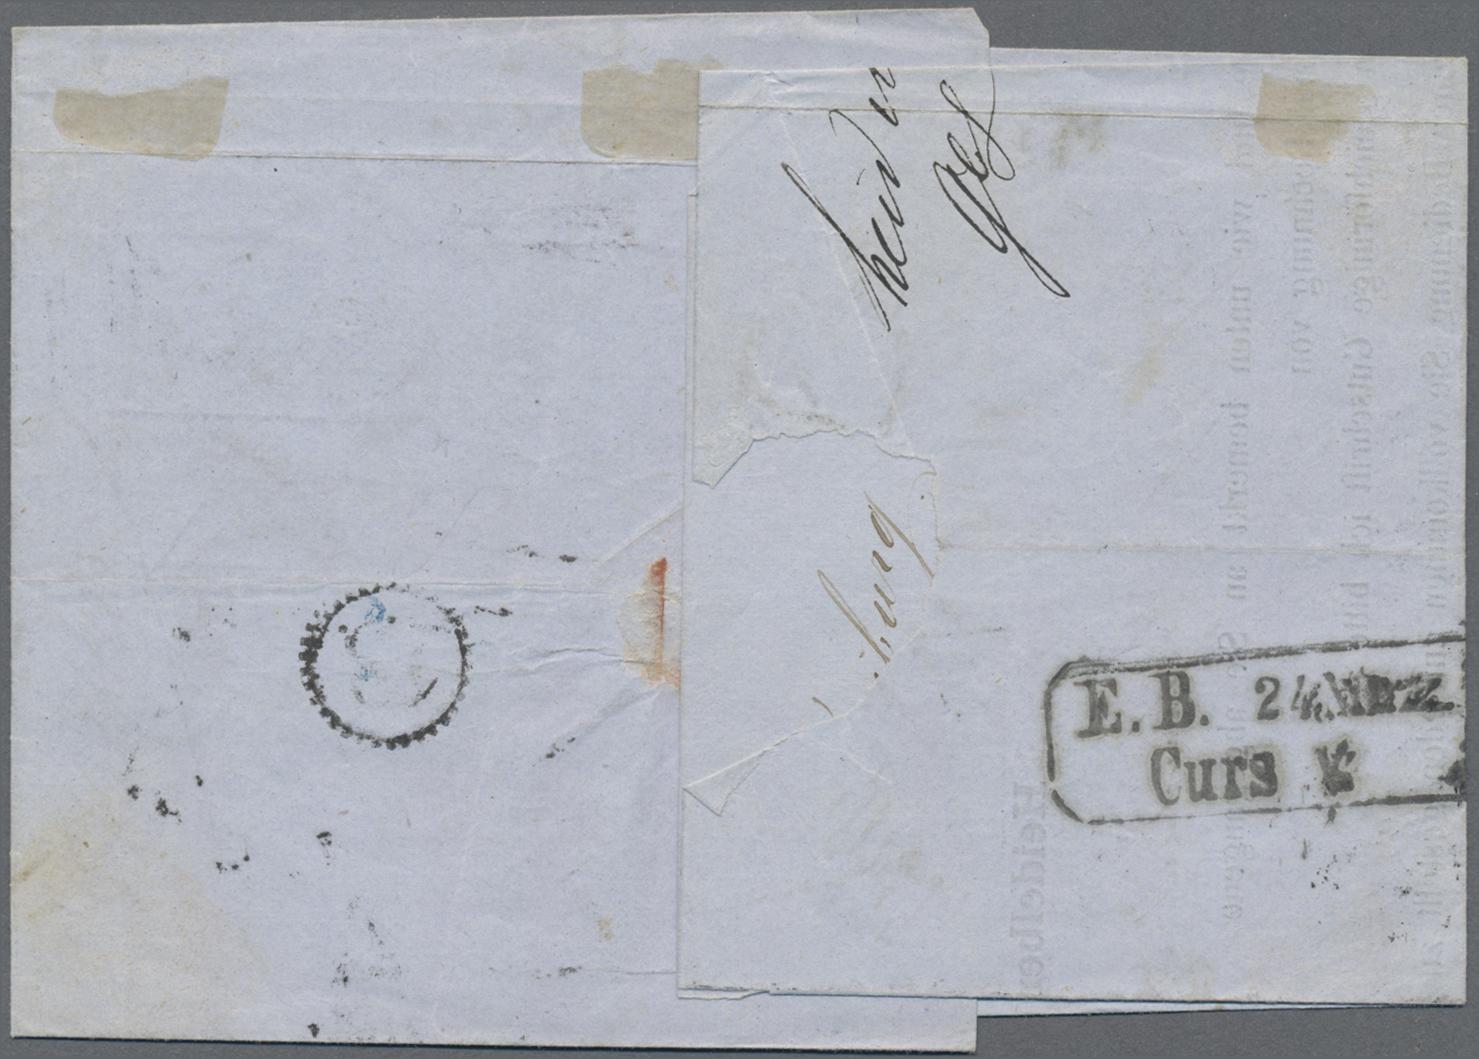 Lot 05020 - Baden - Postablagestempel  -  Auktionshaus Christoph Gärtner GmbH & Co. KG 51th Auction - Day 3